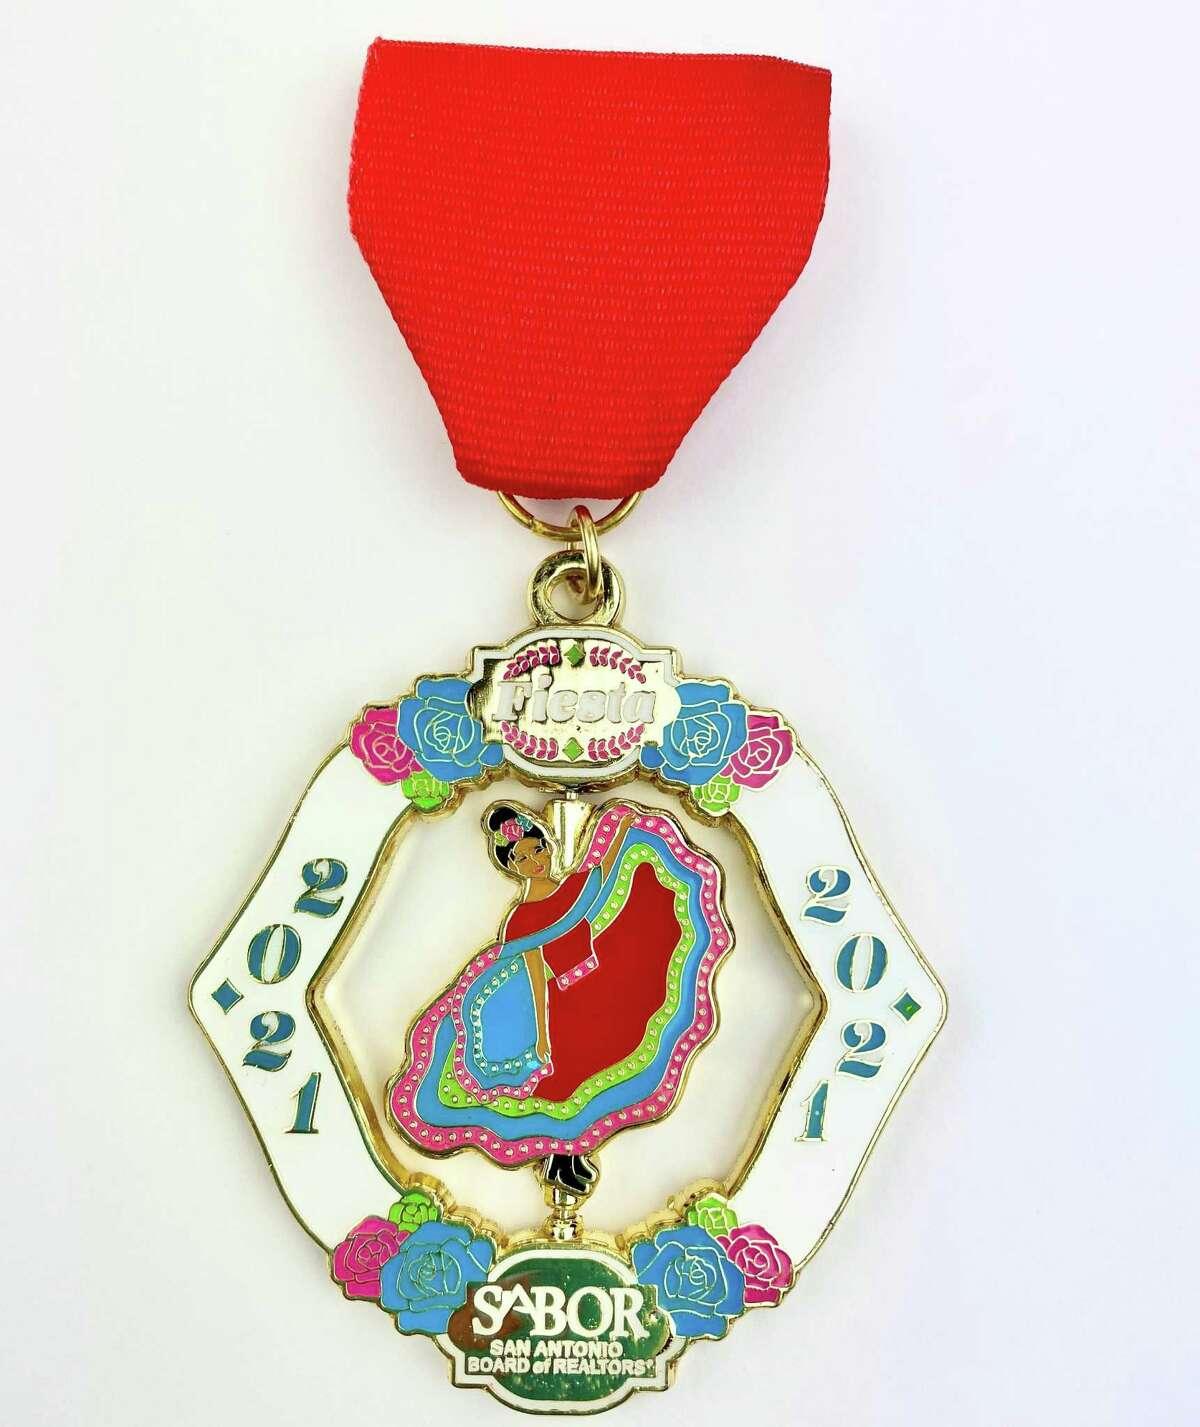 2nd place: Fiesta 2021 by SABOR, San Antonio Board of Realtors ($10 at member.sabor.com/product/2021-fiesta-medal)